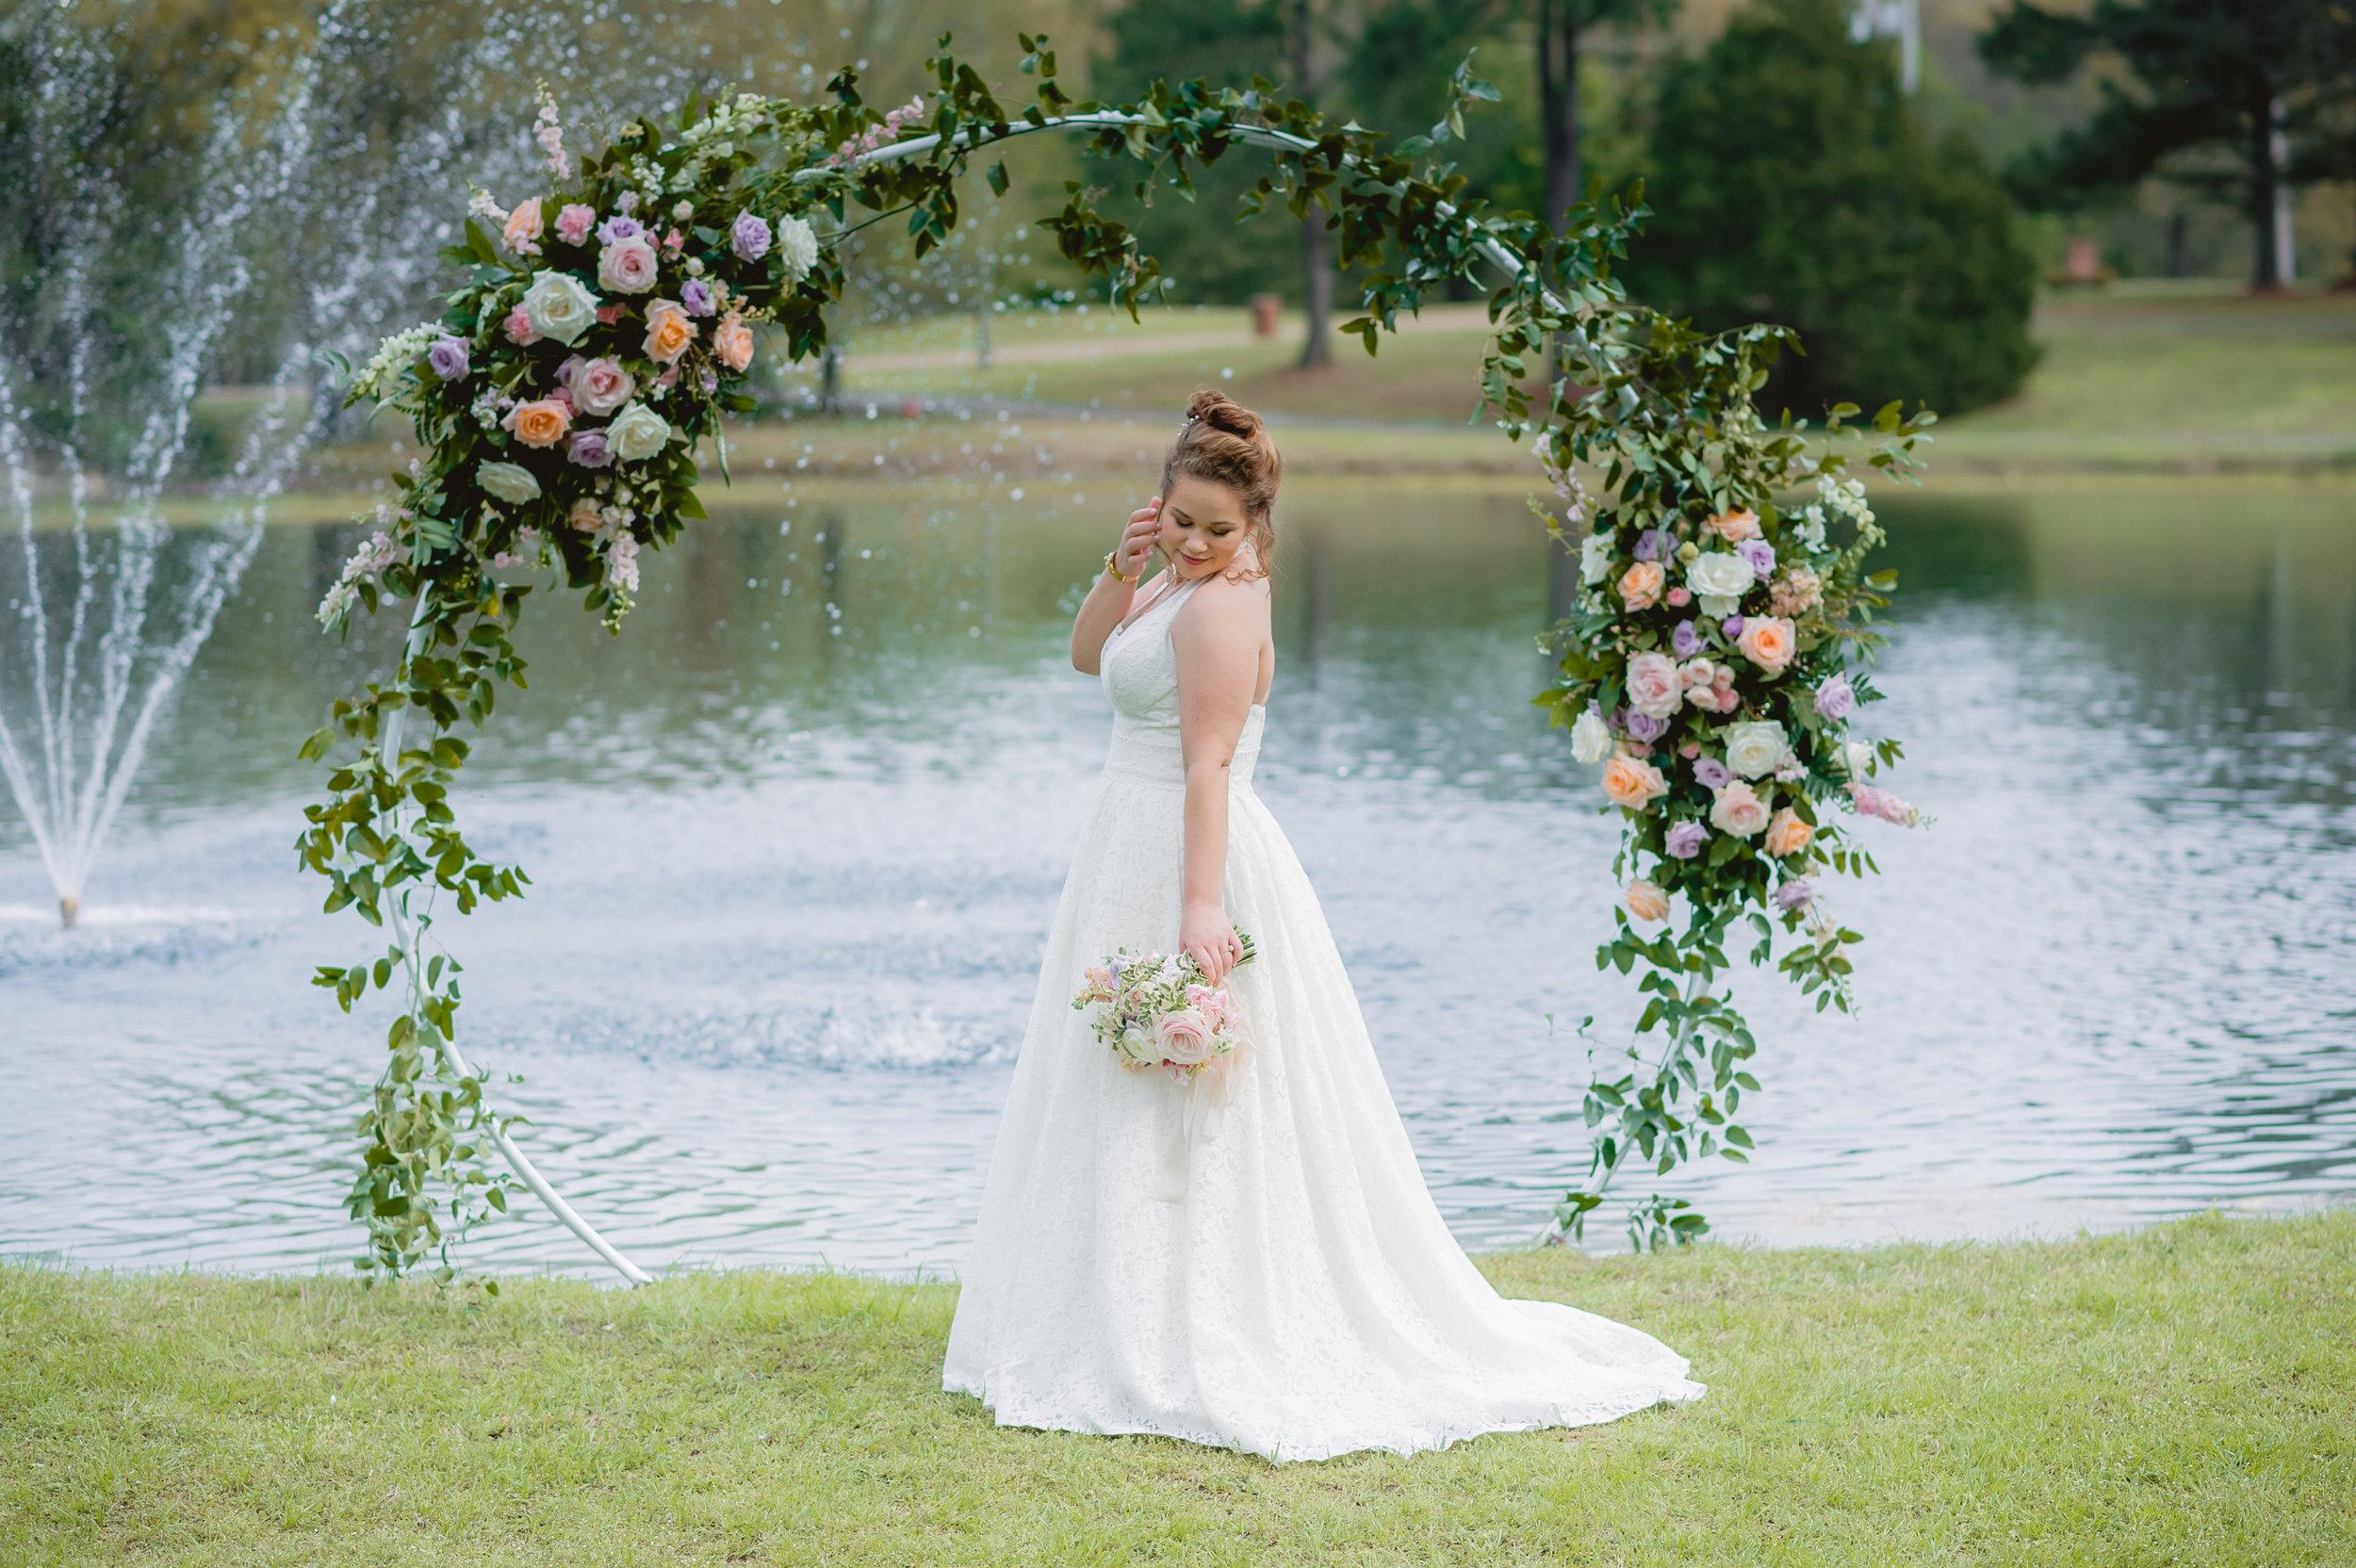 Crystal Pond Garden: Real Wedding